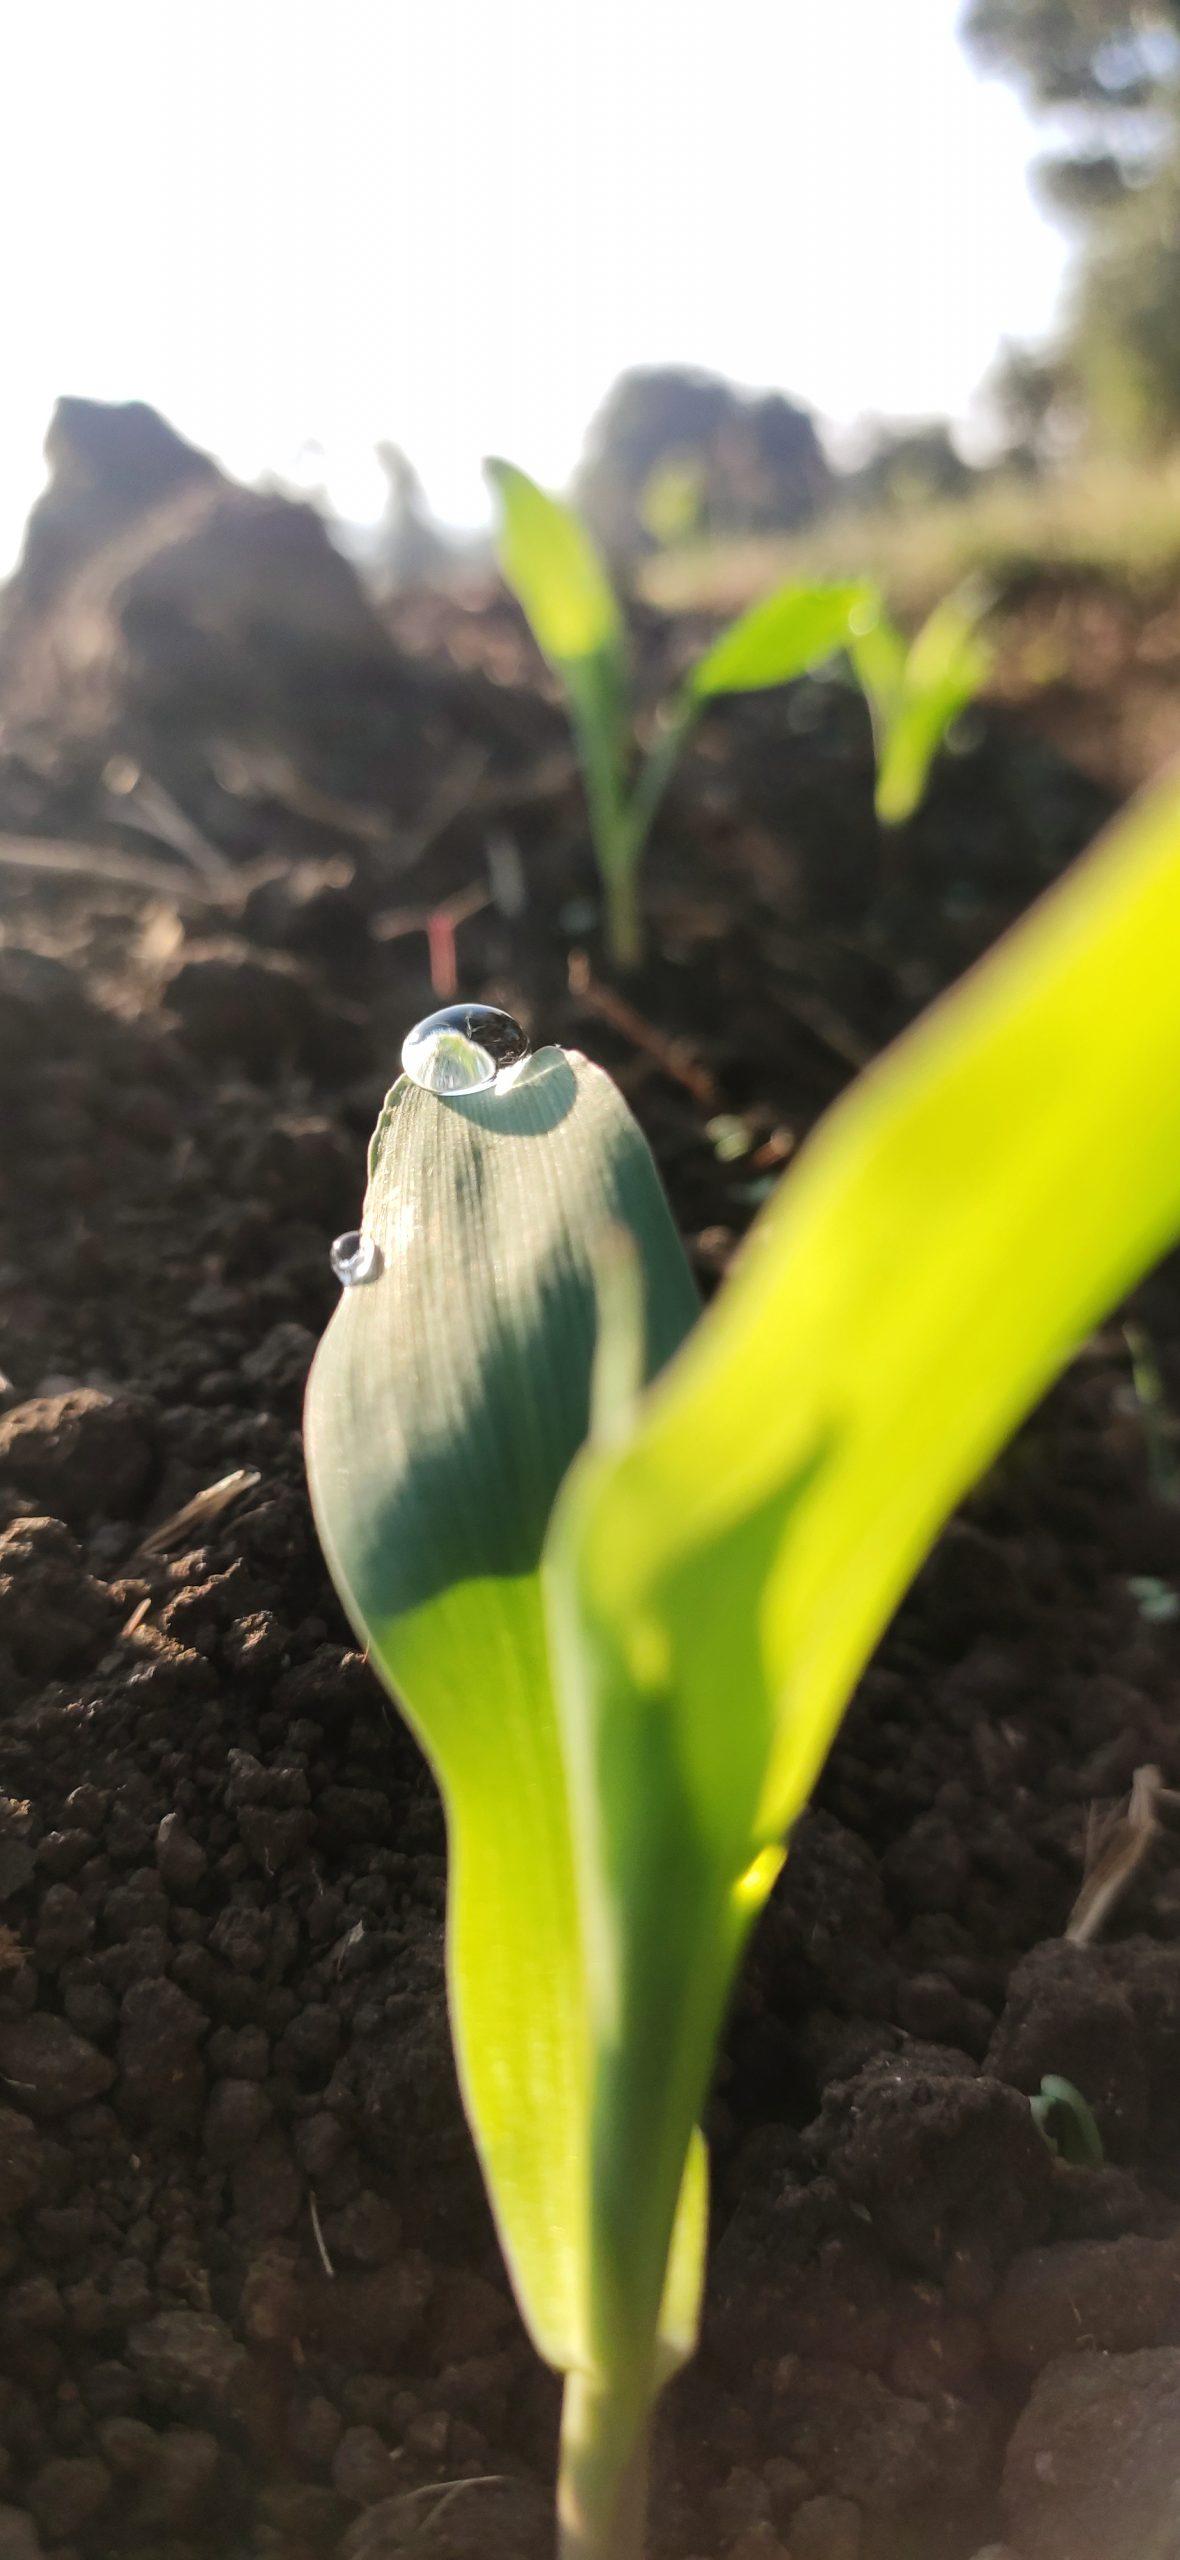 Dew drop on crop leaf